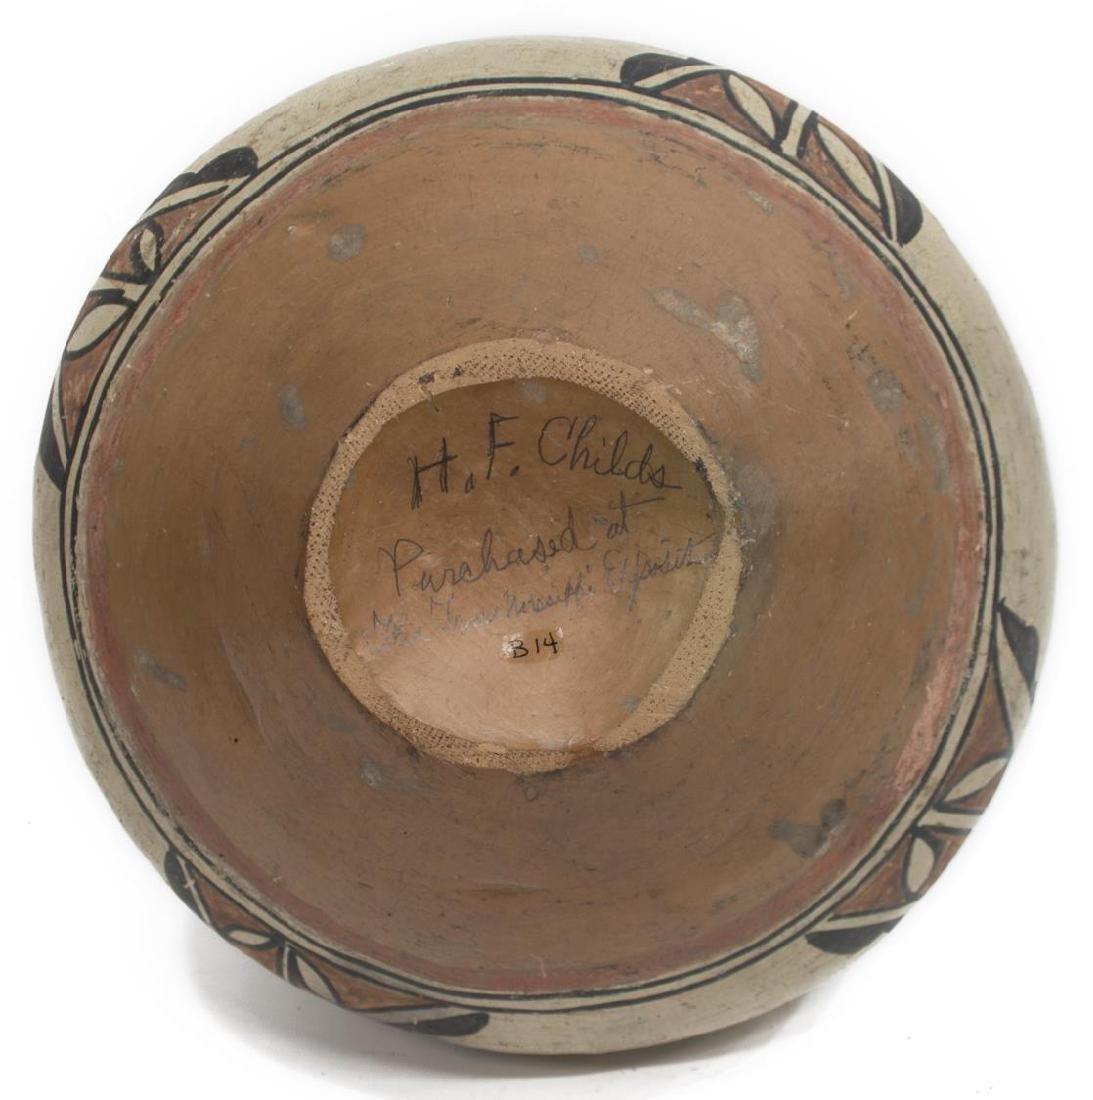 SAN ILEDFONSO POLYCHROME JAR, C. 1900-1915 - 5